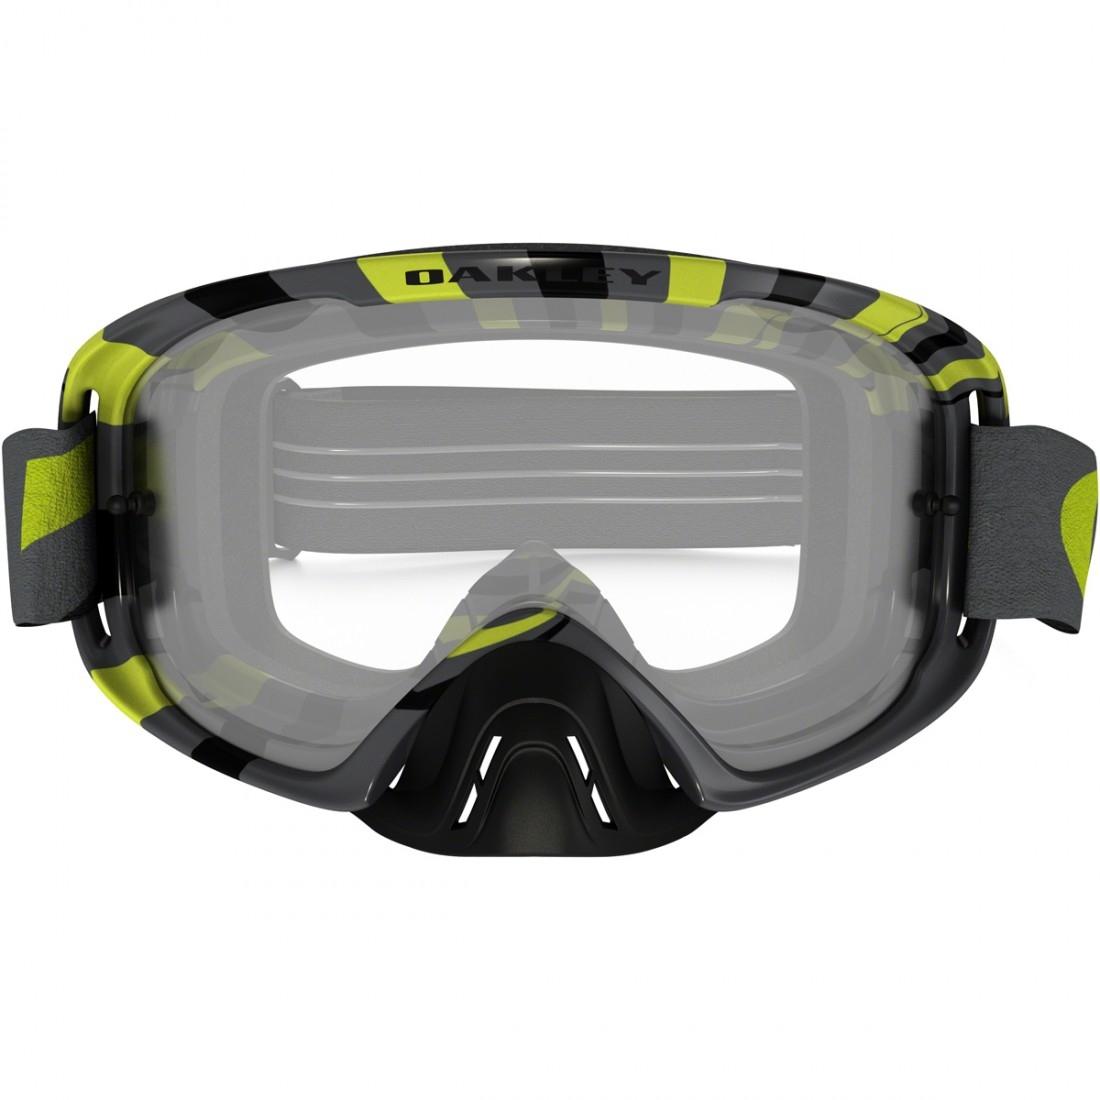 6d1e090d6a OAKLEY O2 MX RPM Gunmetal   Green Clear Goggles · Motocard